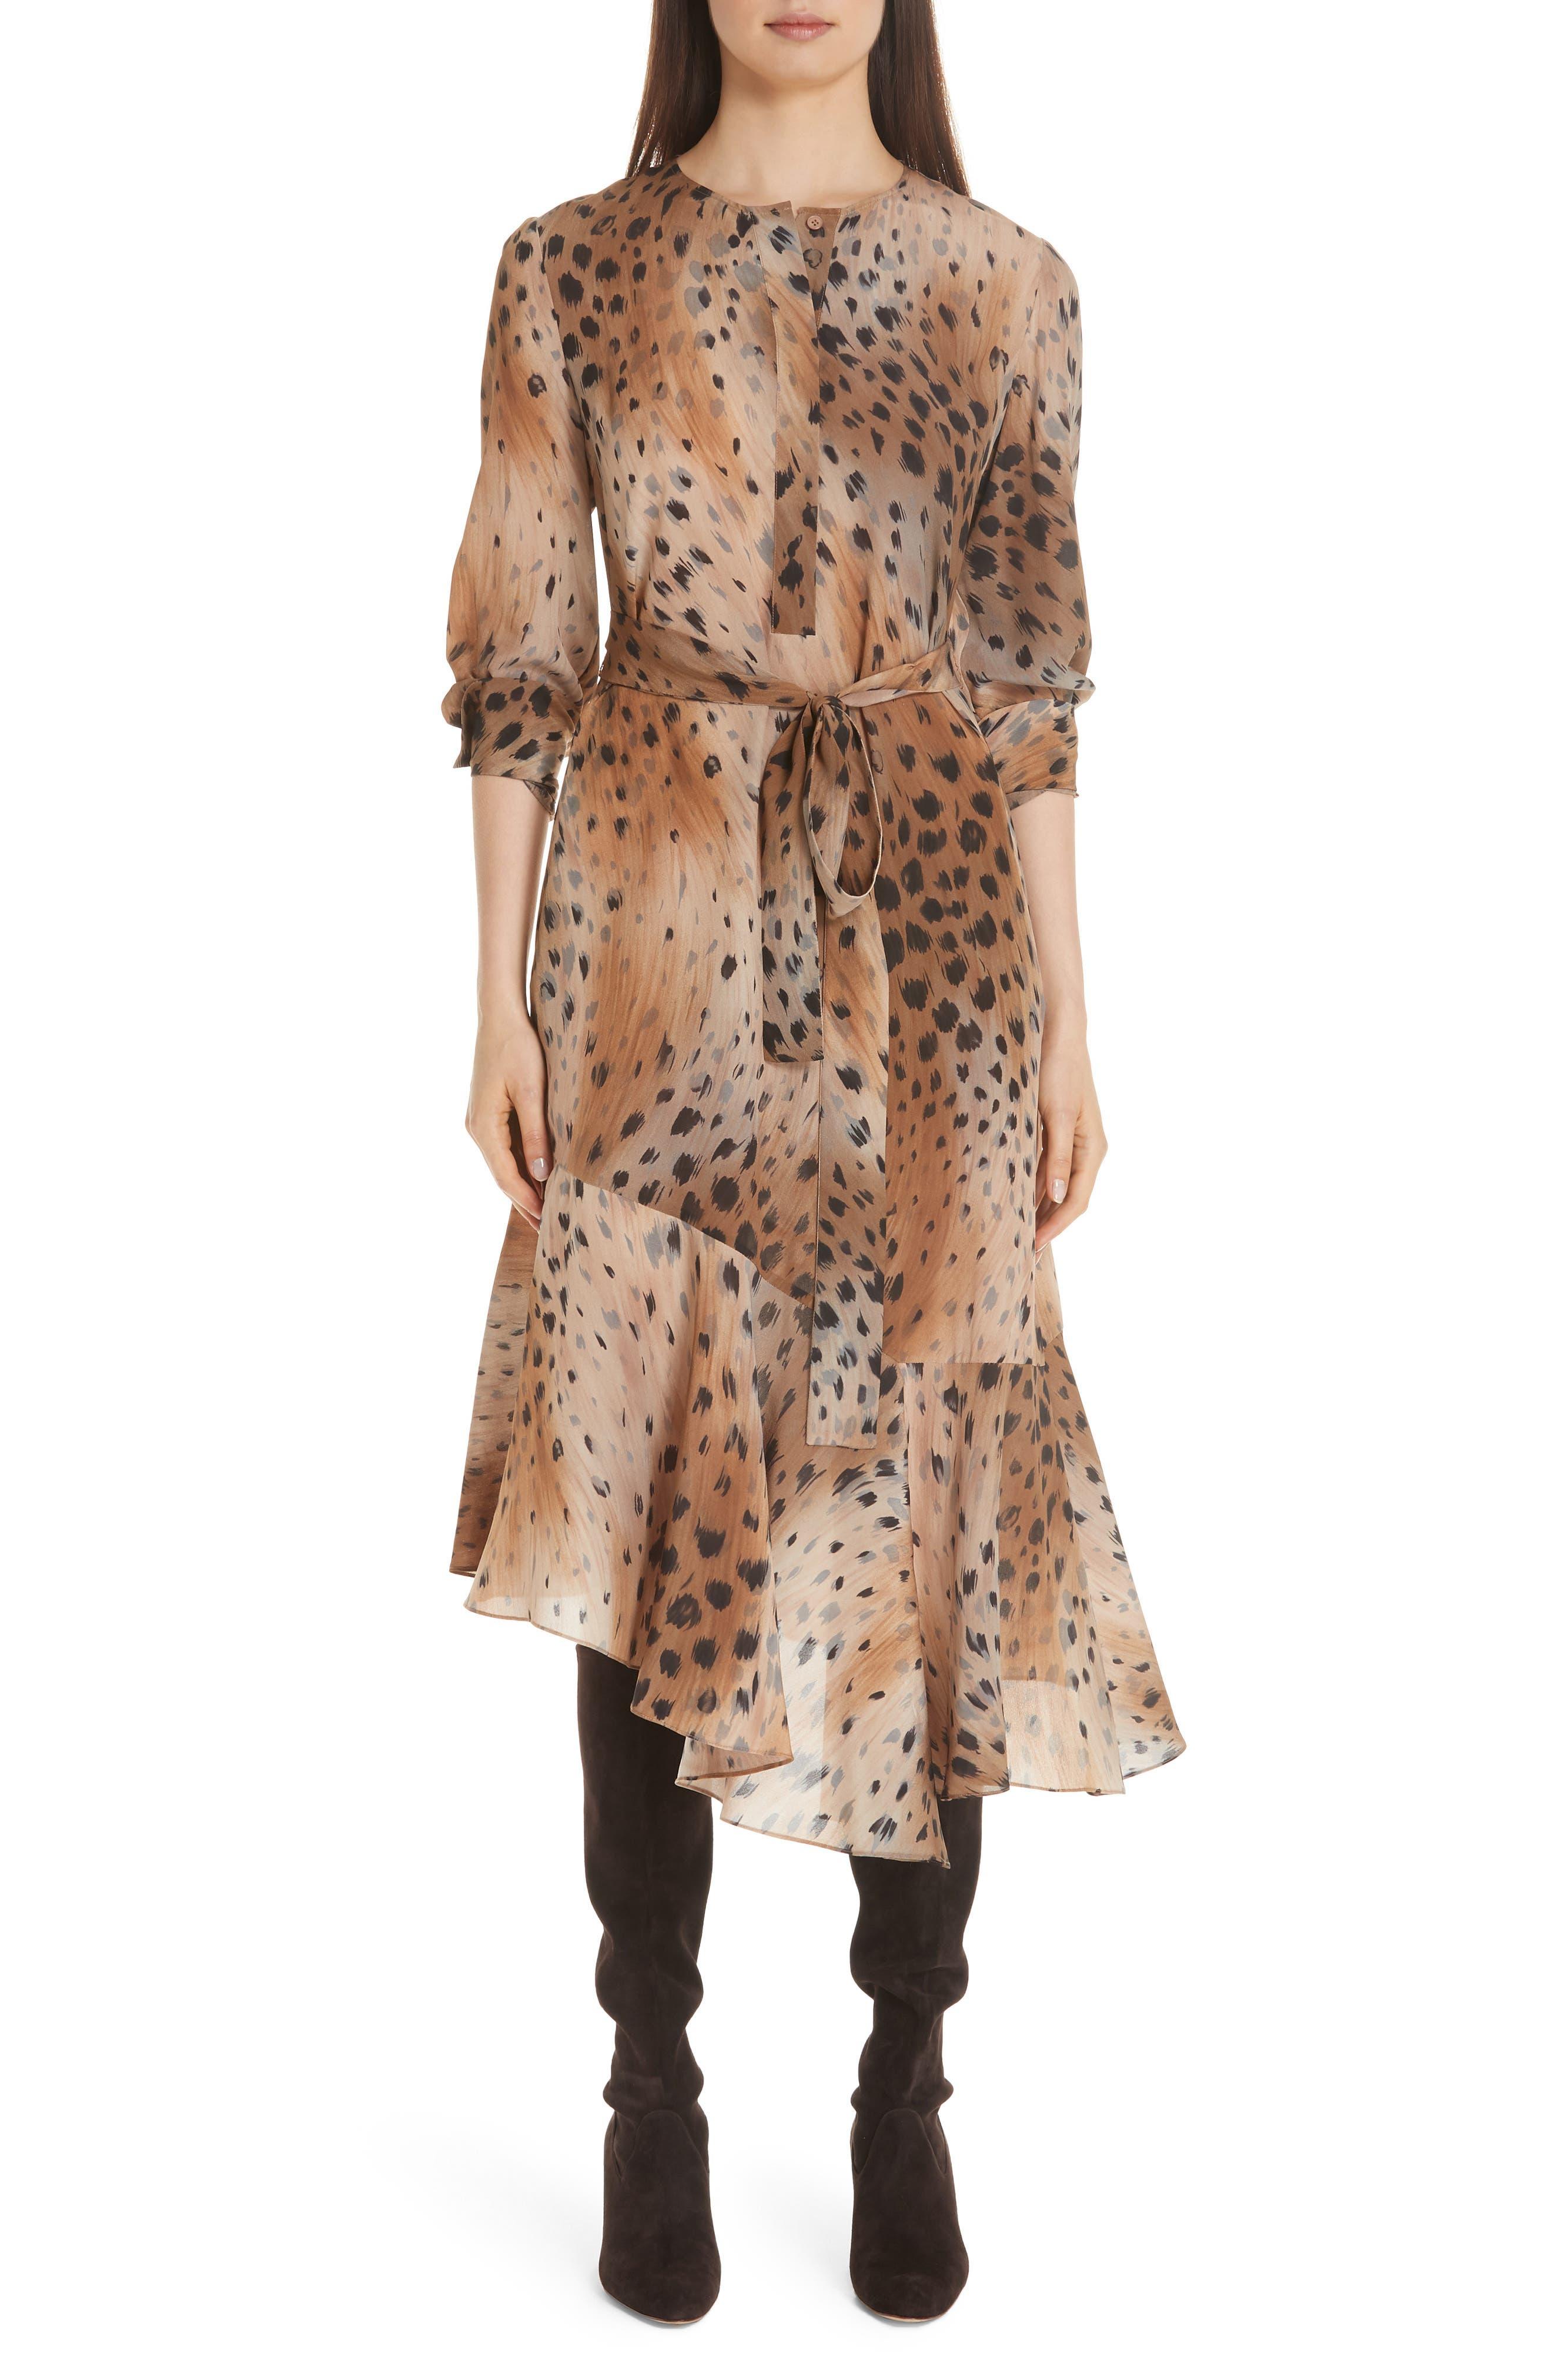 LAFAYETTE 148 Delancy Agave Leopard-Print Silk Dress in Saddle Multi